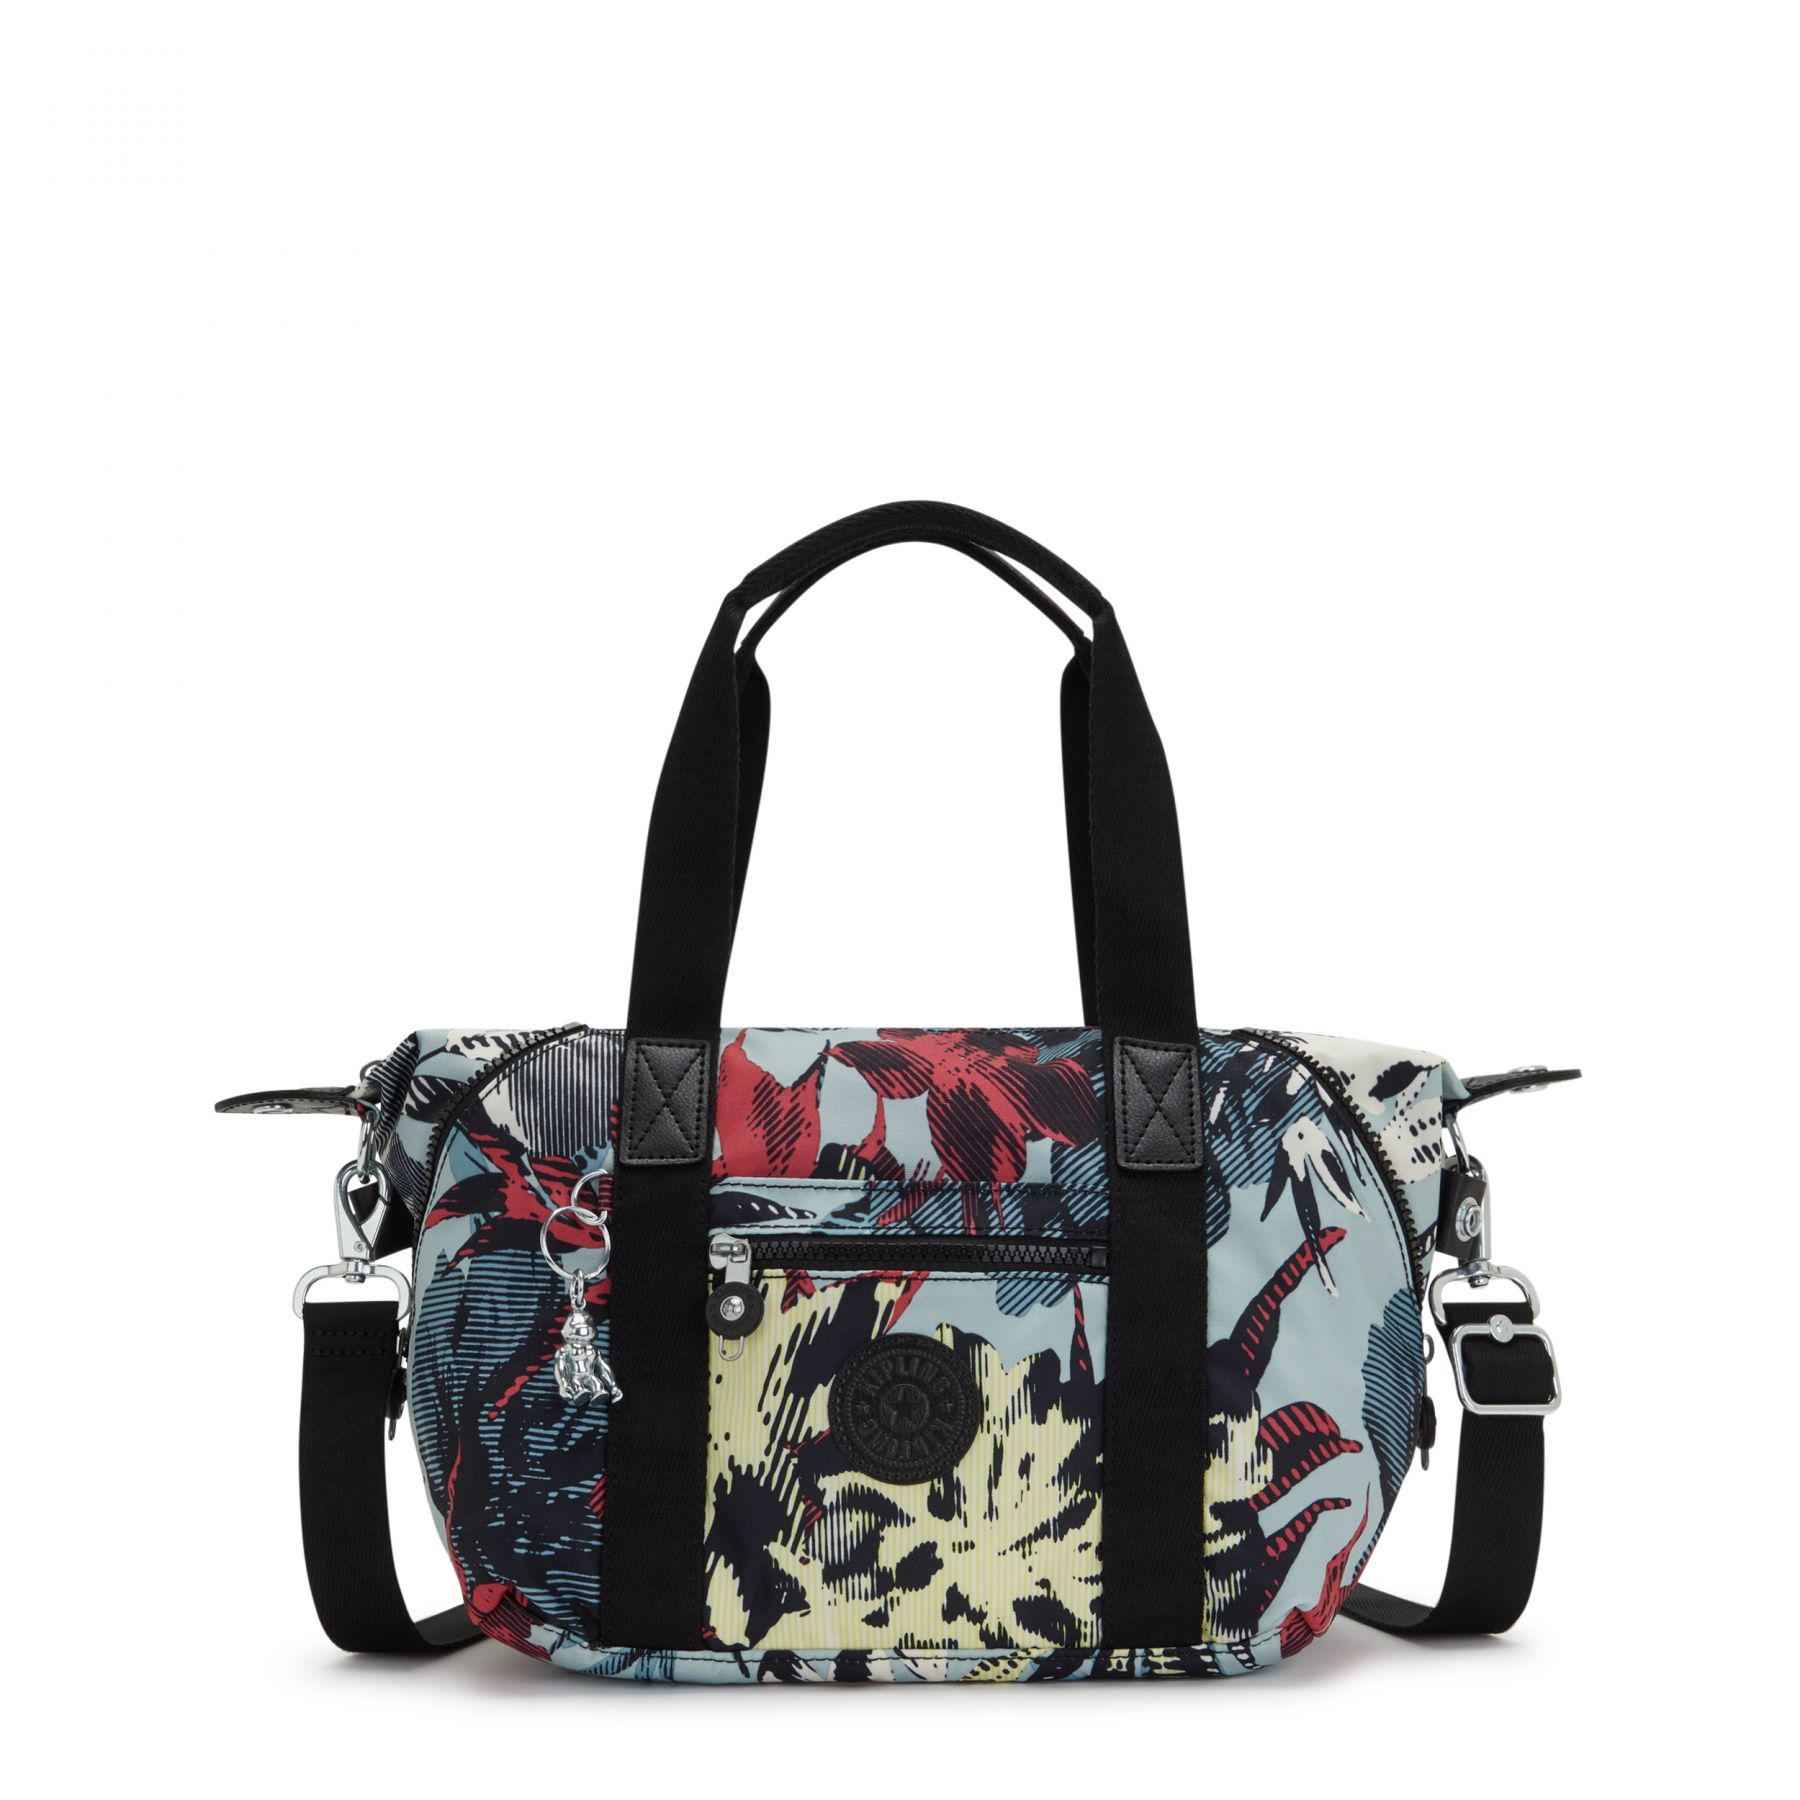 ART MINI BAGS by Kipling - Front view